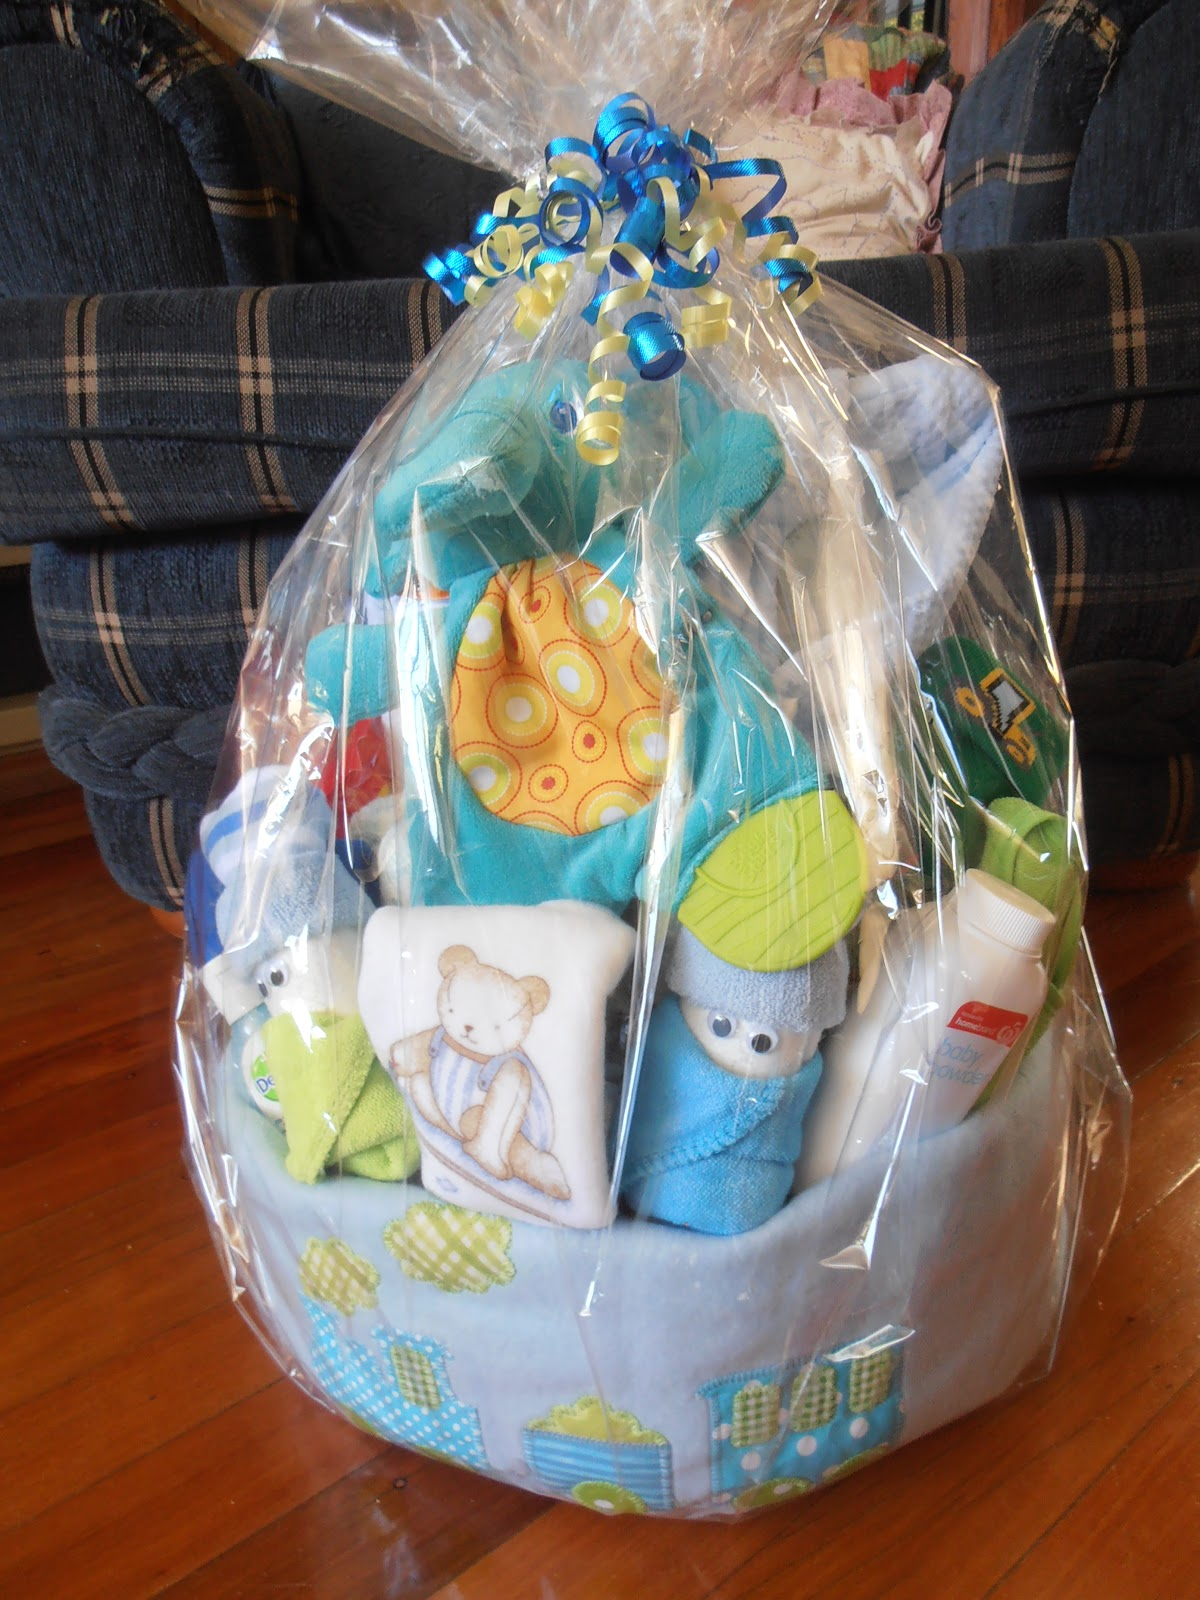 Crafty Friends Baby Gift Ideas